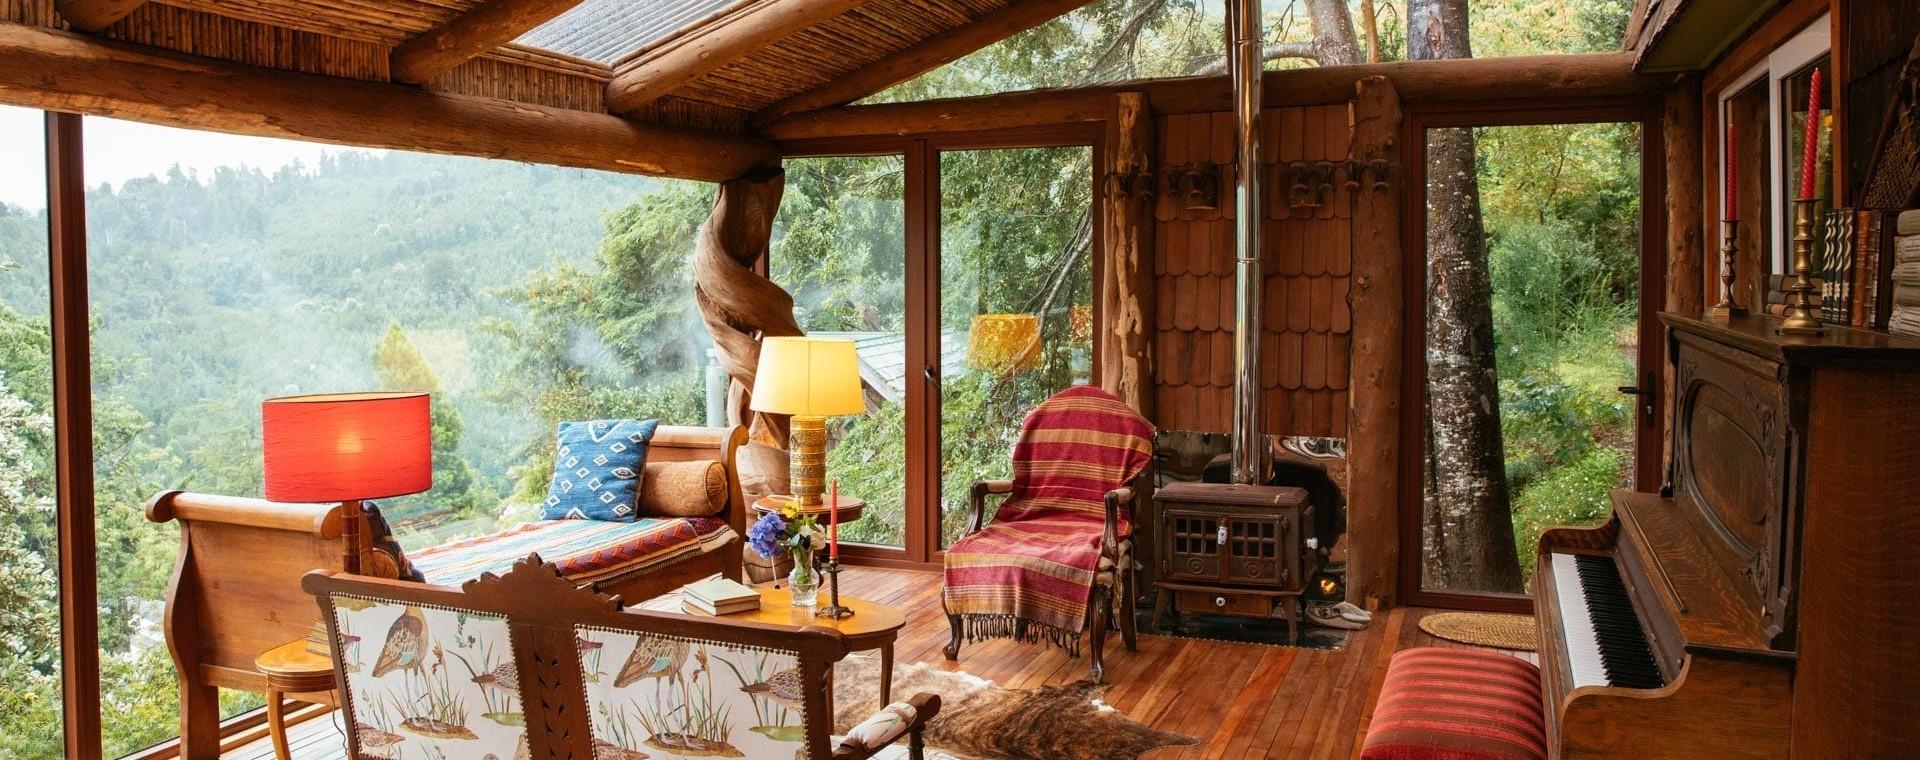 Barraco Lodge, Chile | Plan South America